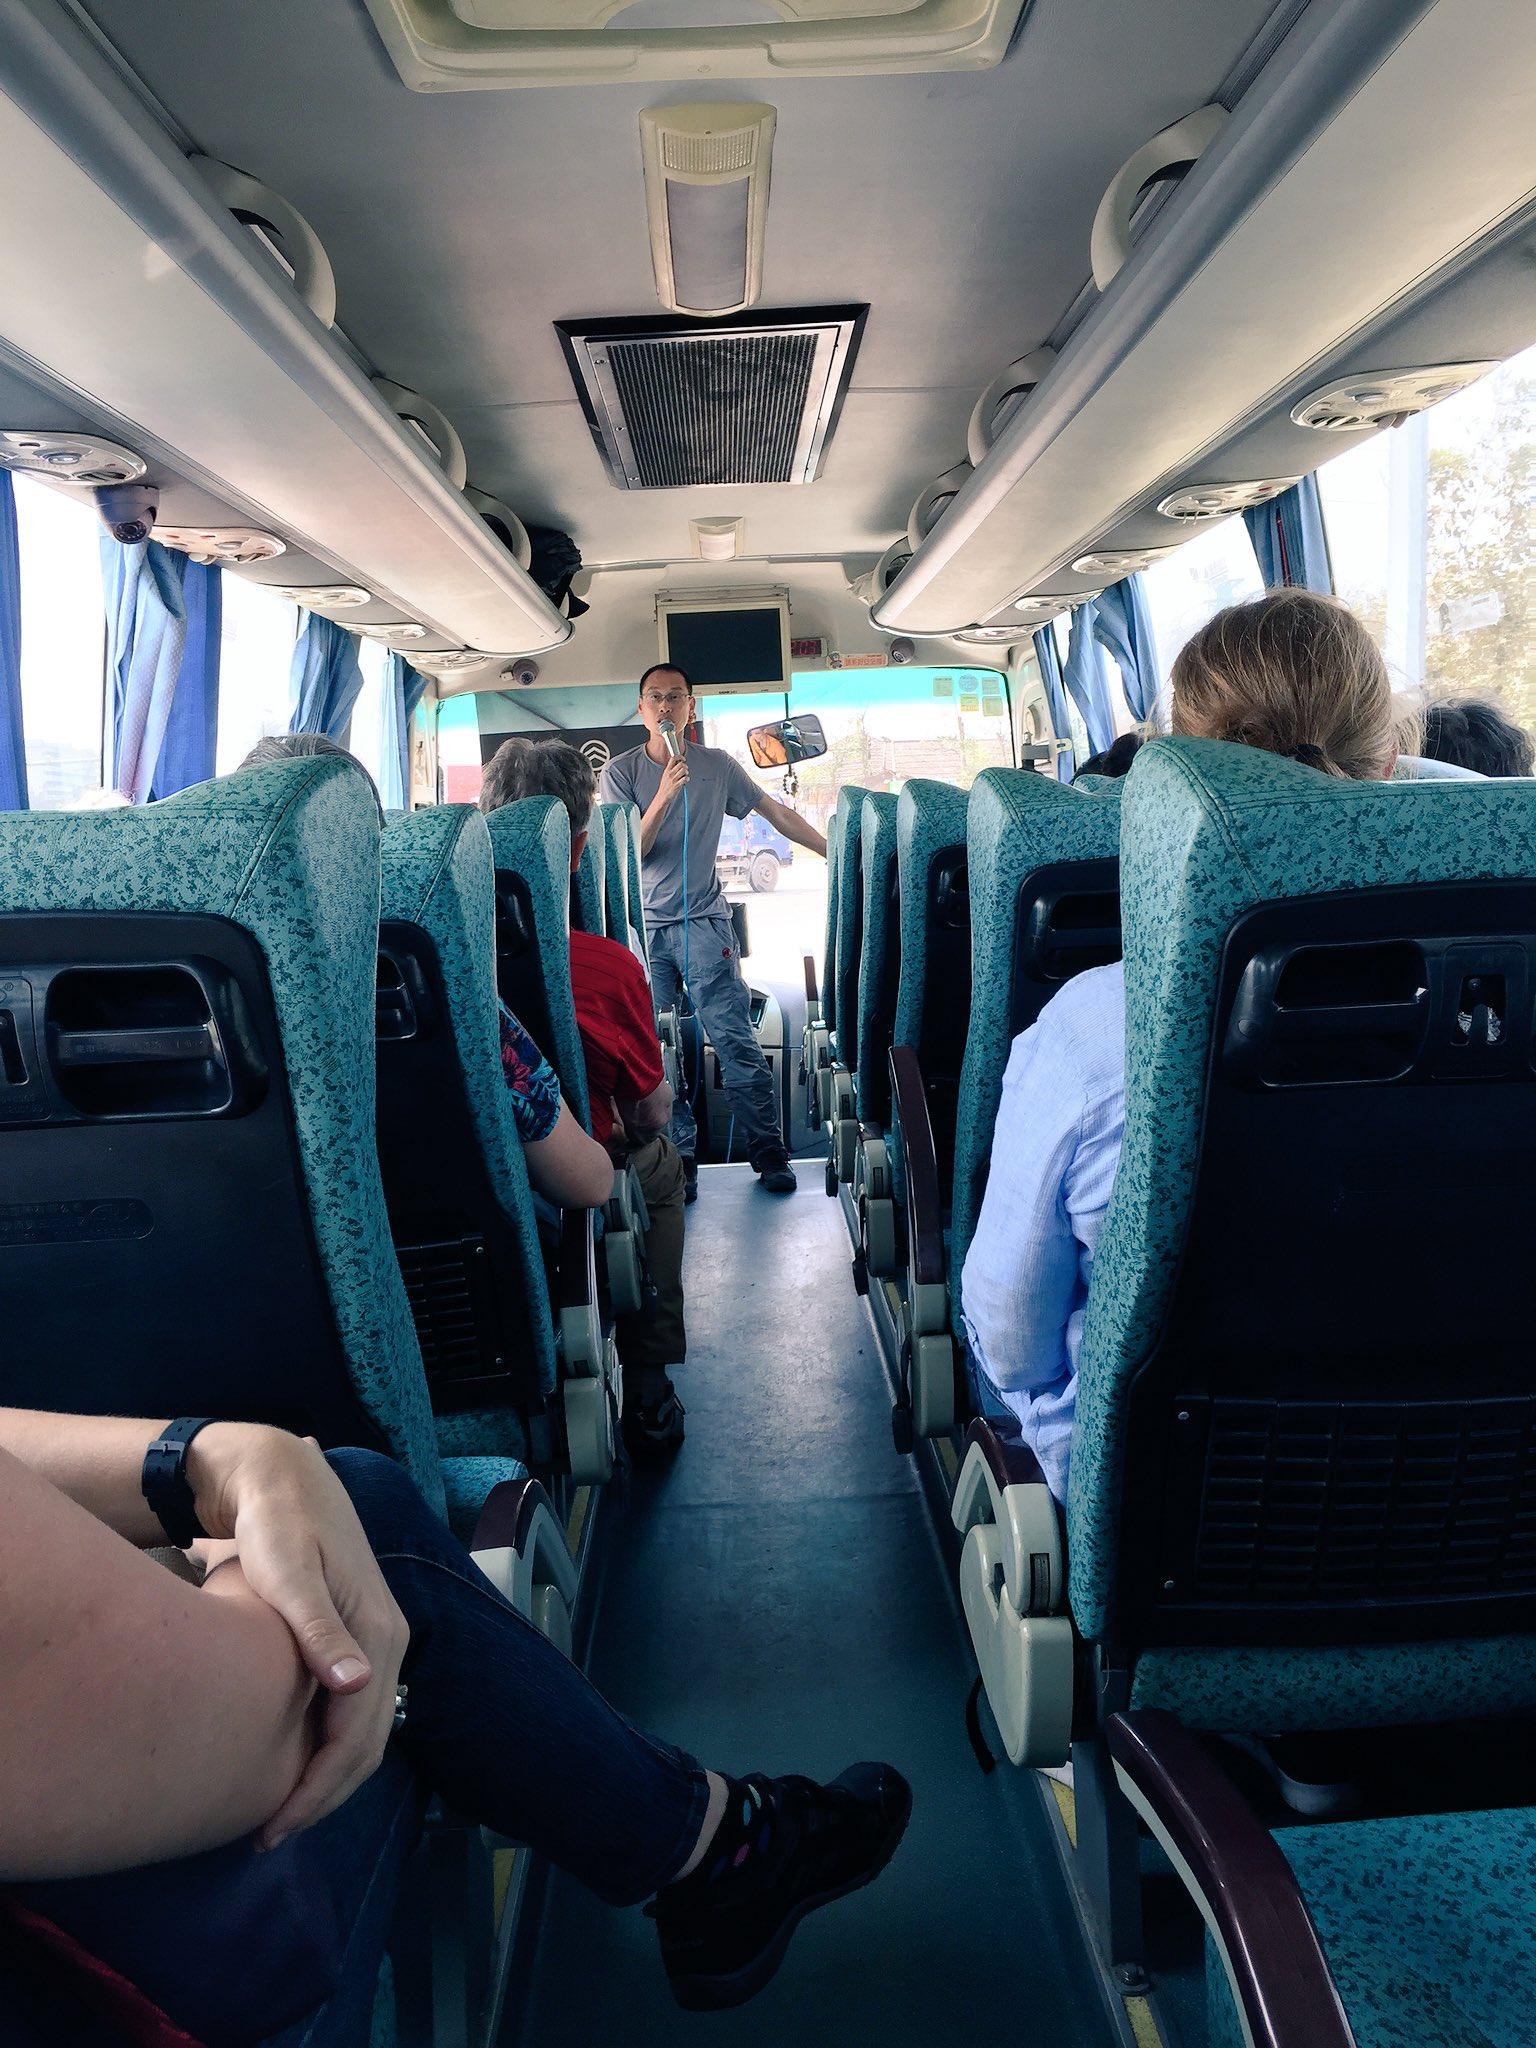 Stony Xiao, our tour guide, introducing us to Jiangmen. https://t.co/FJL36PCS4x